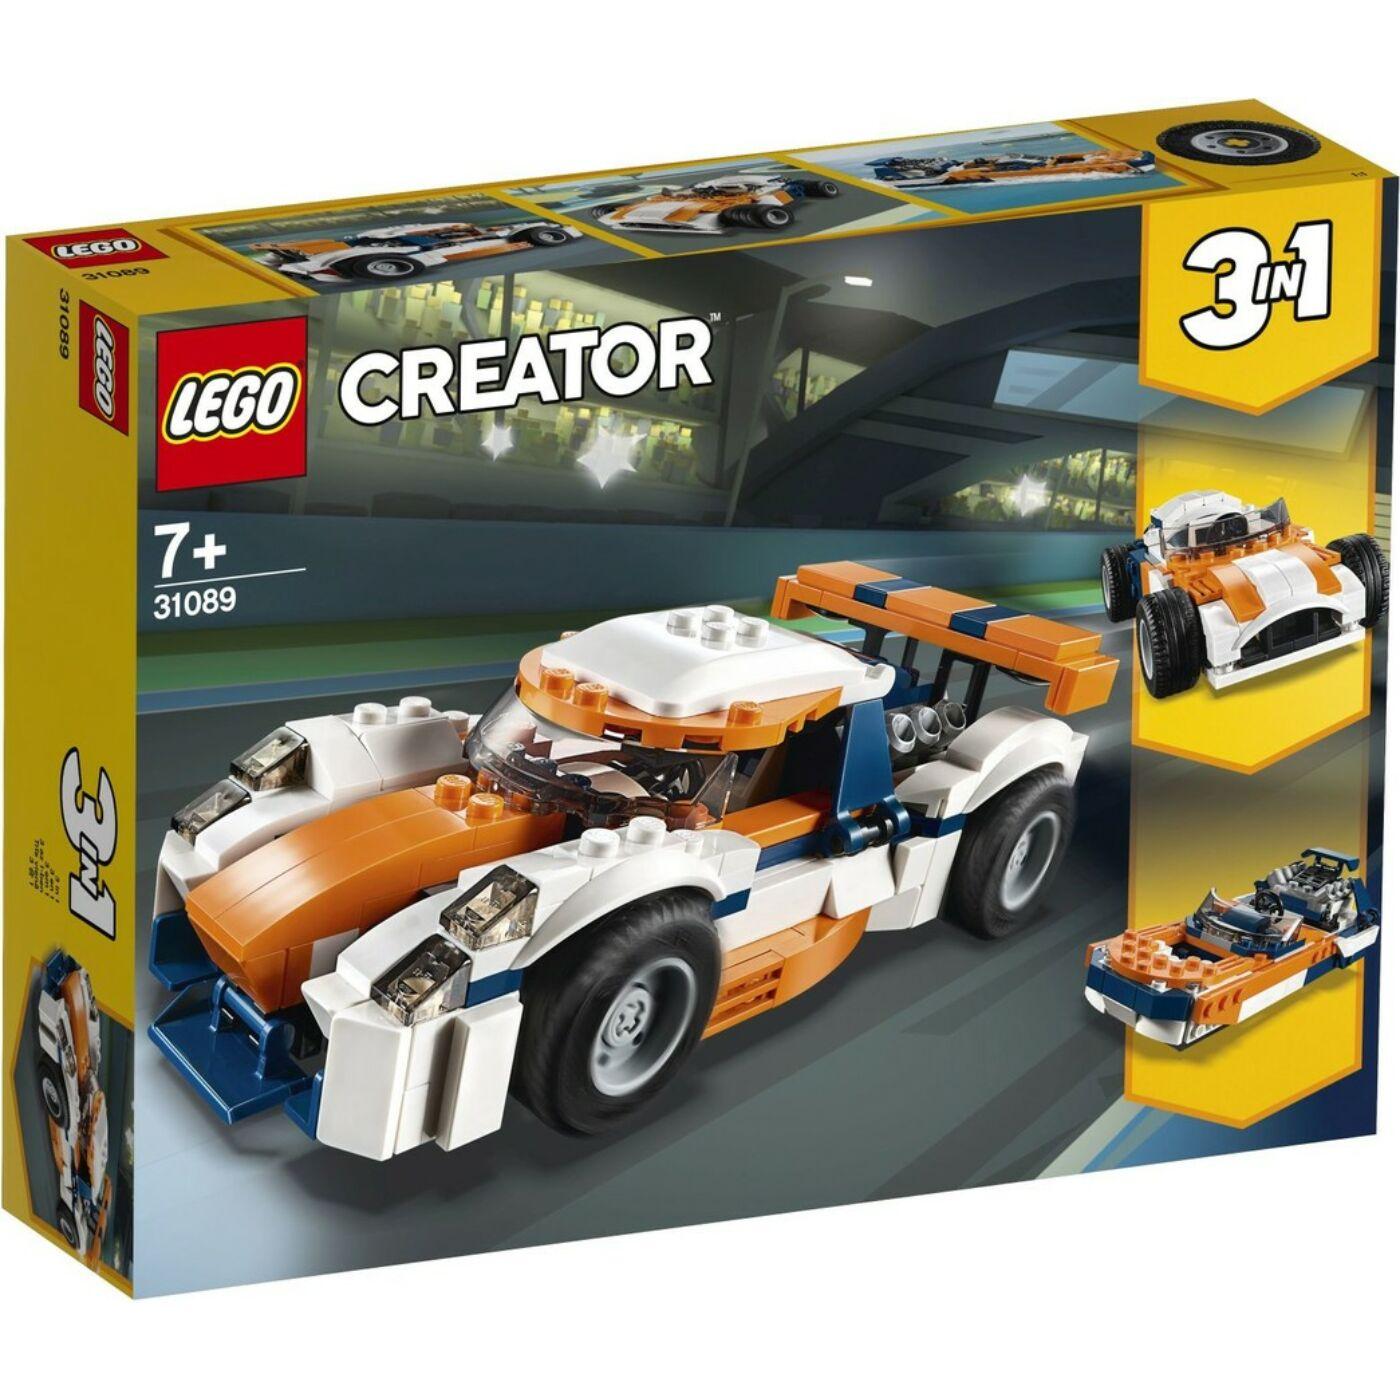 Lego Creator Sunset versenyautó